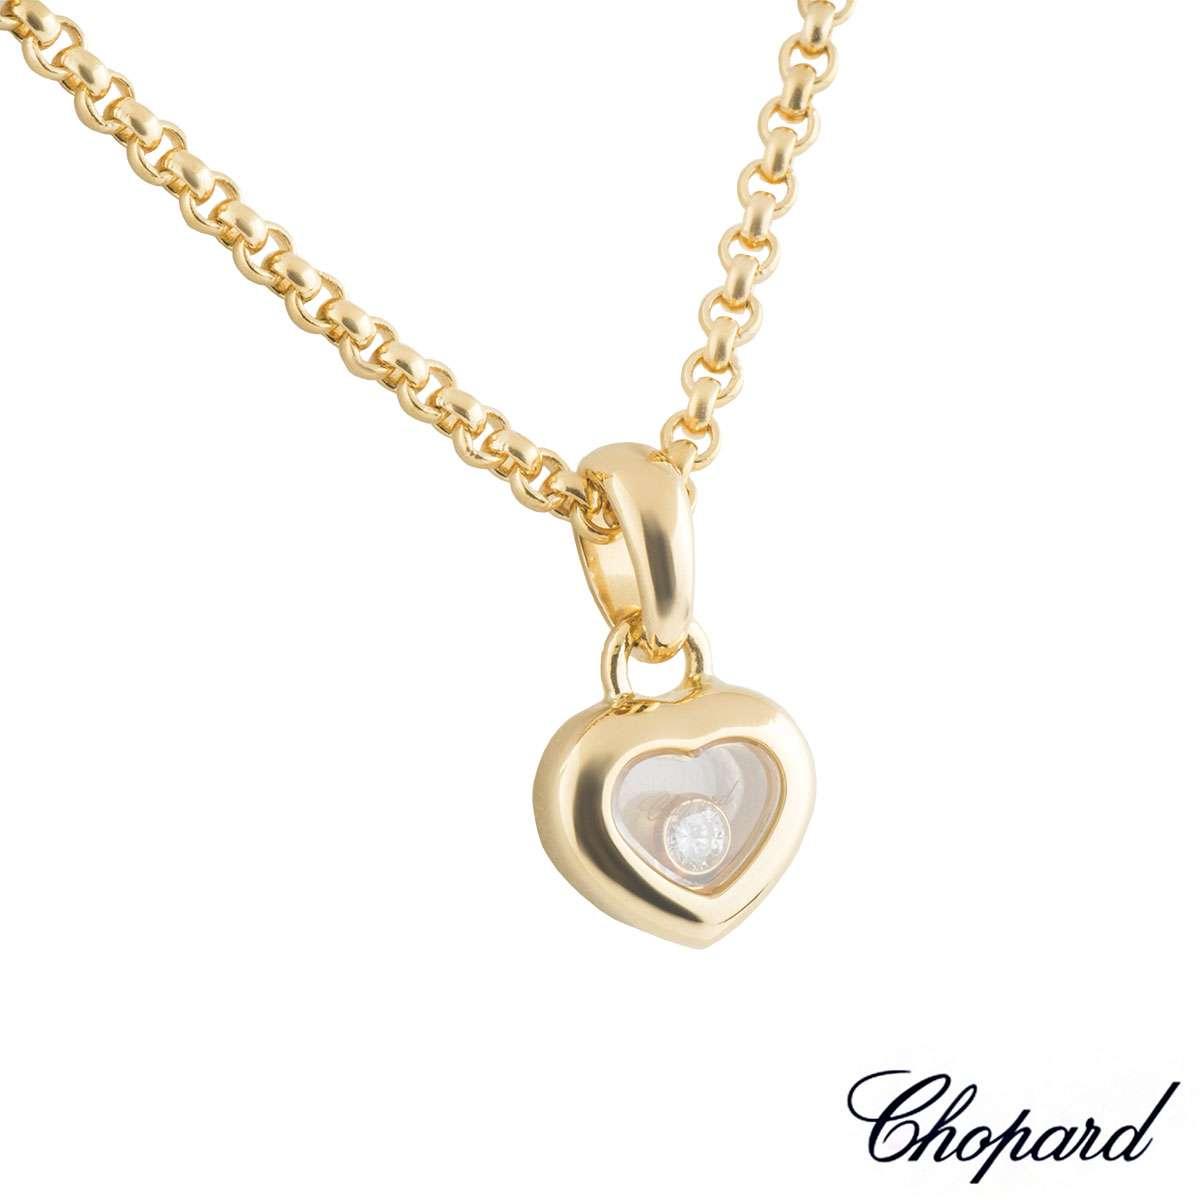 Chopard Yellow Gold Happy Diamonds Pendant79/4854